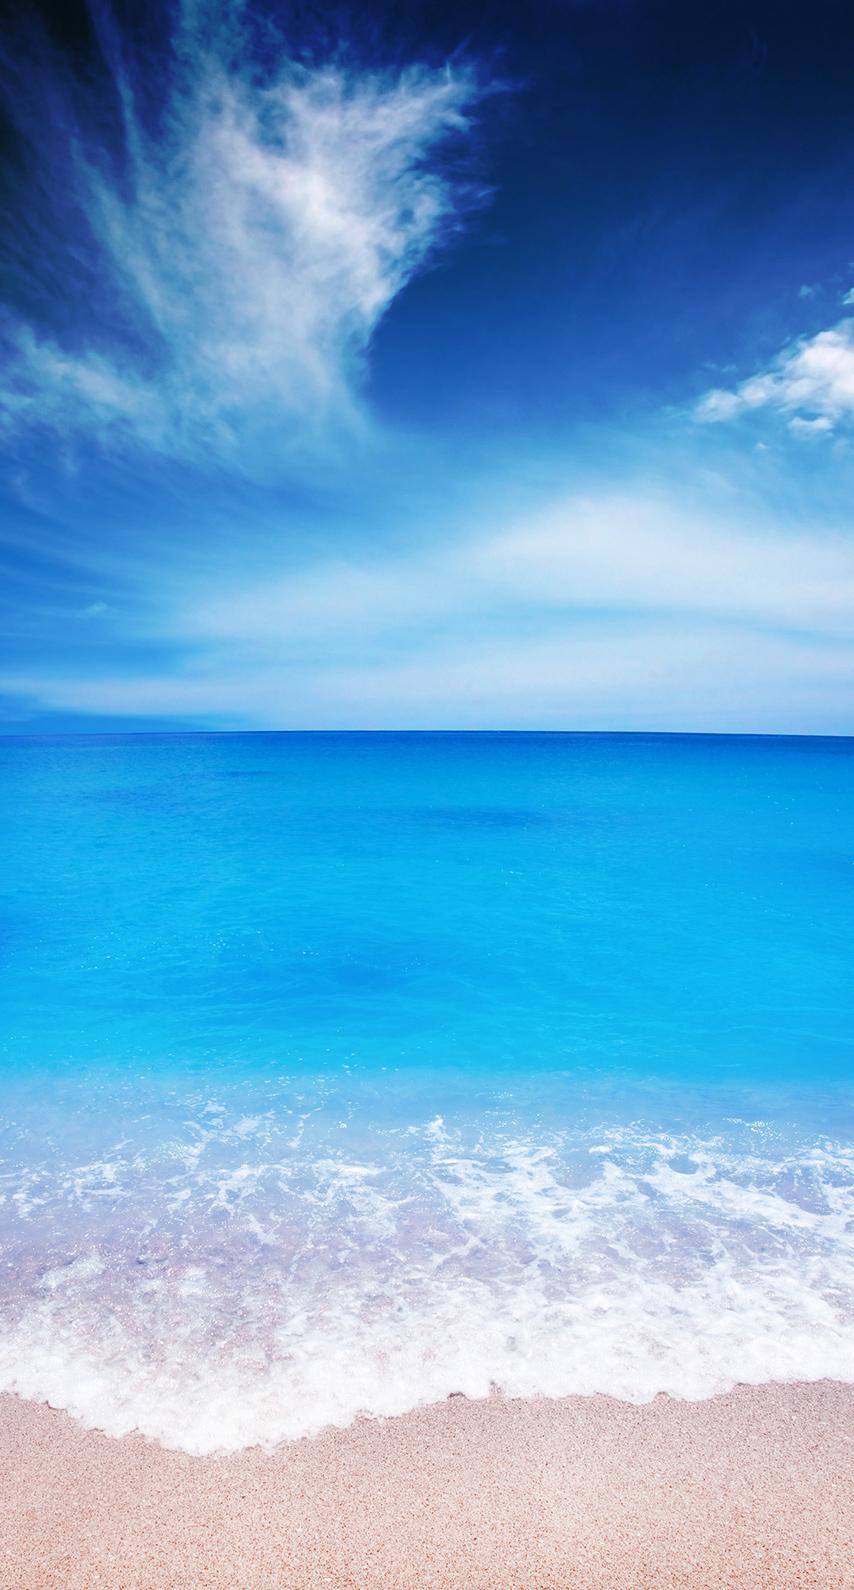 ocean, sky